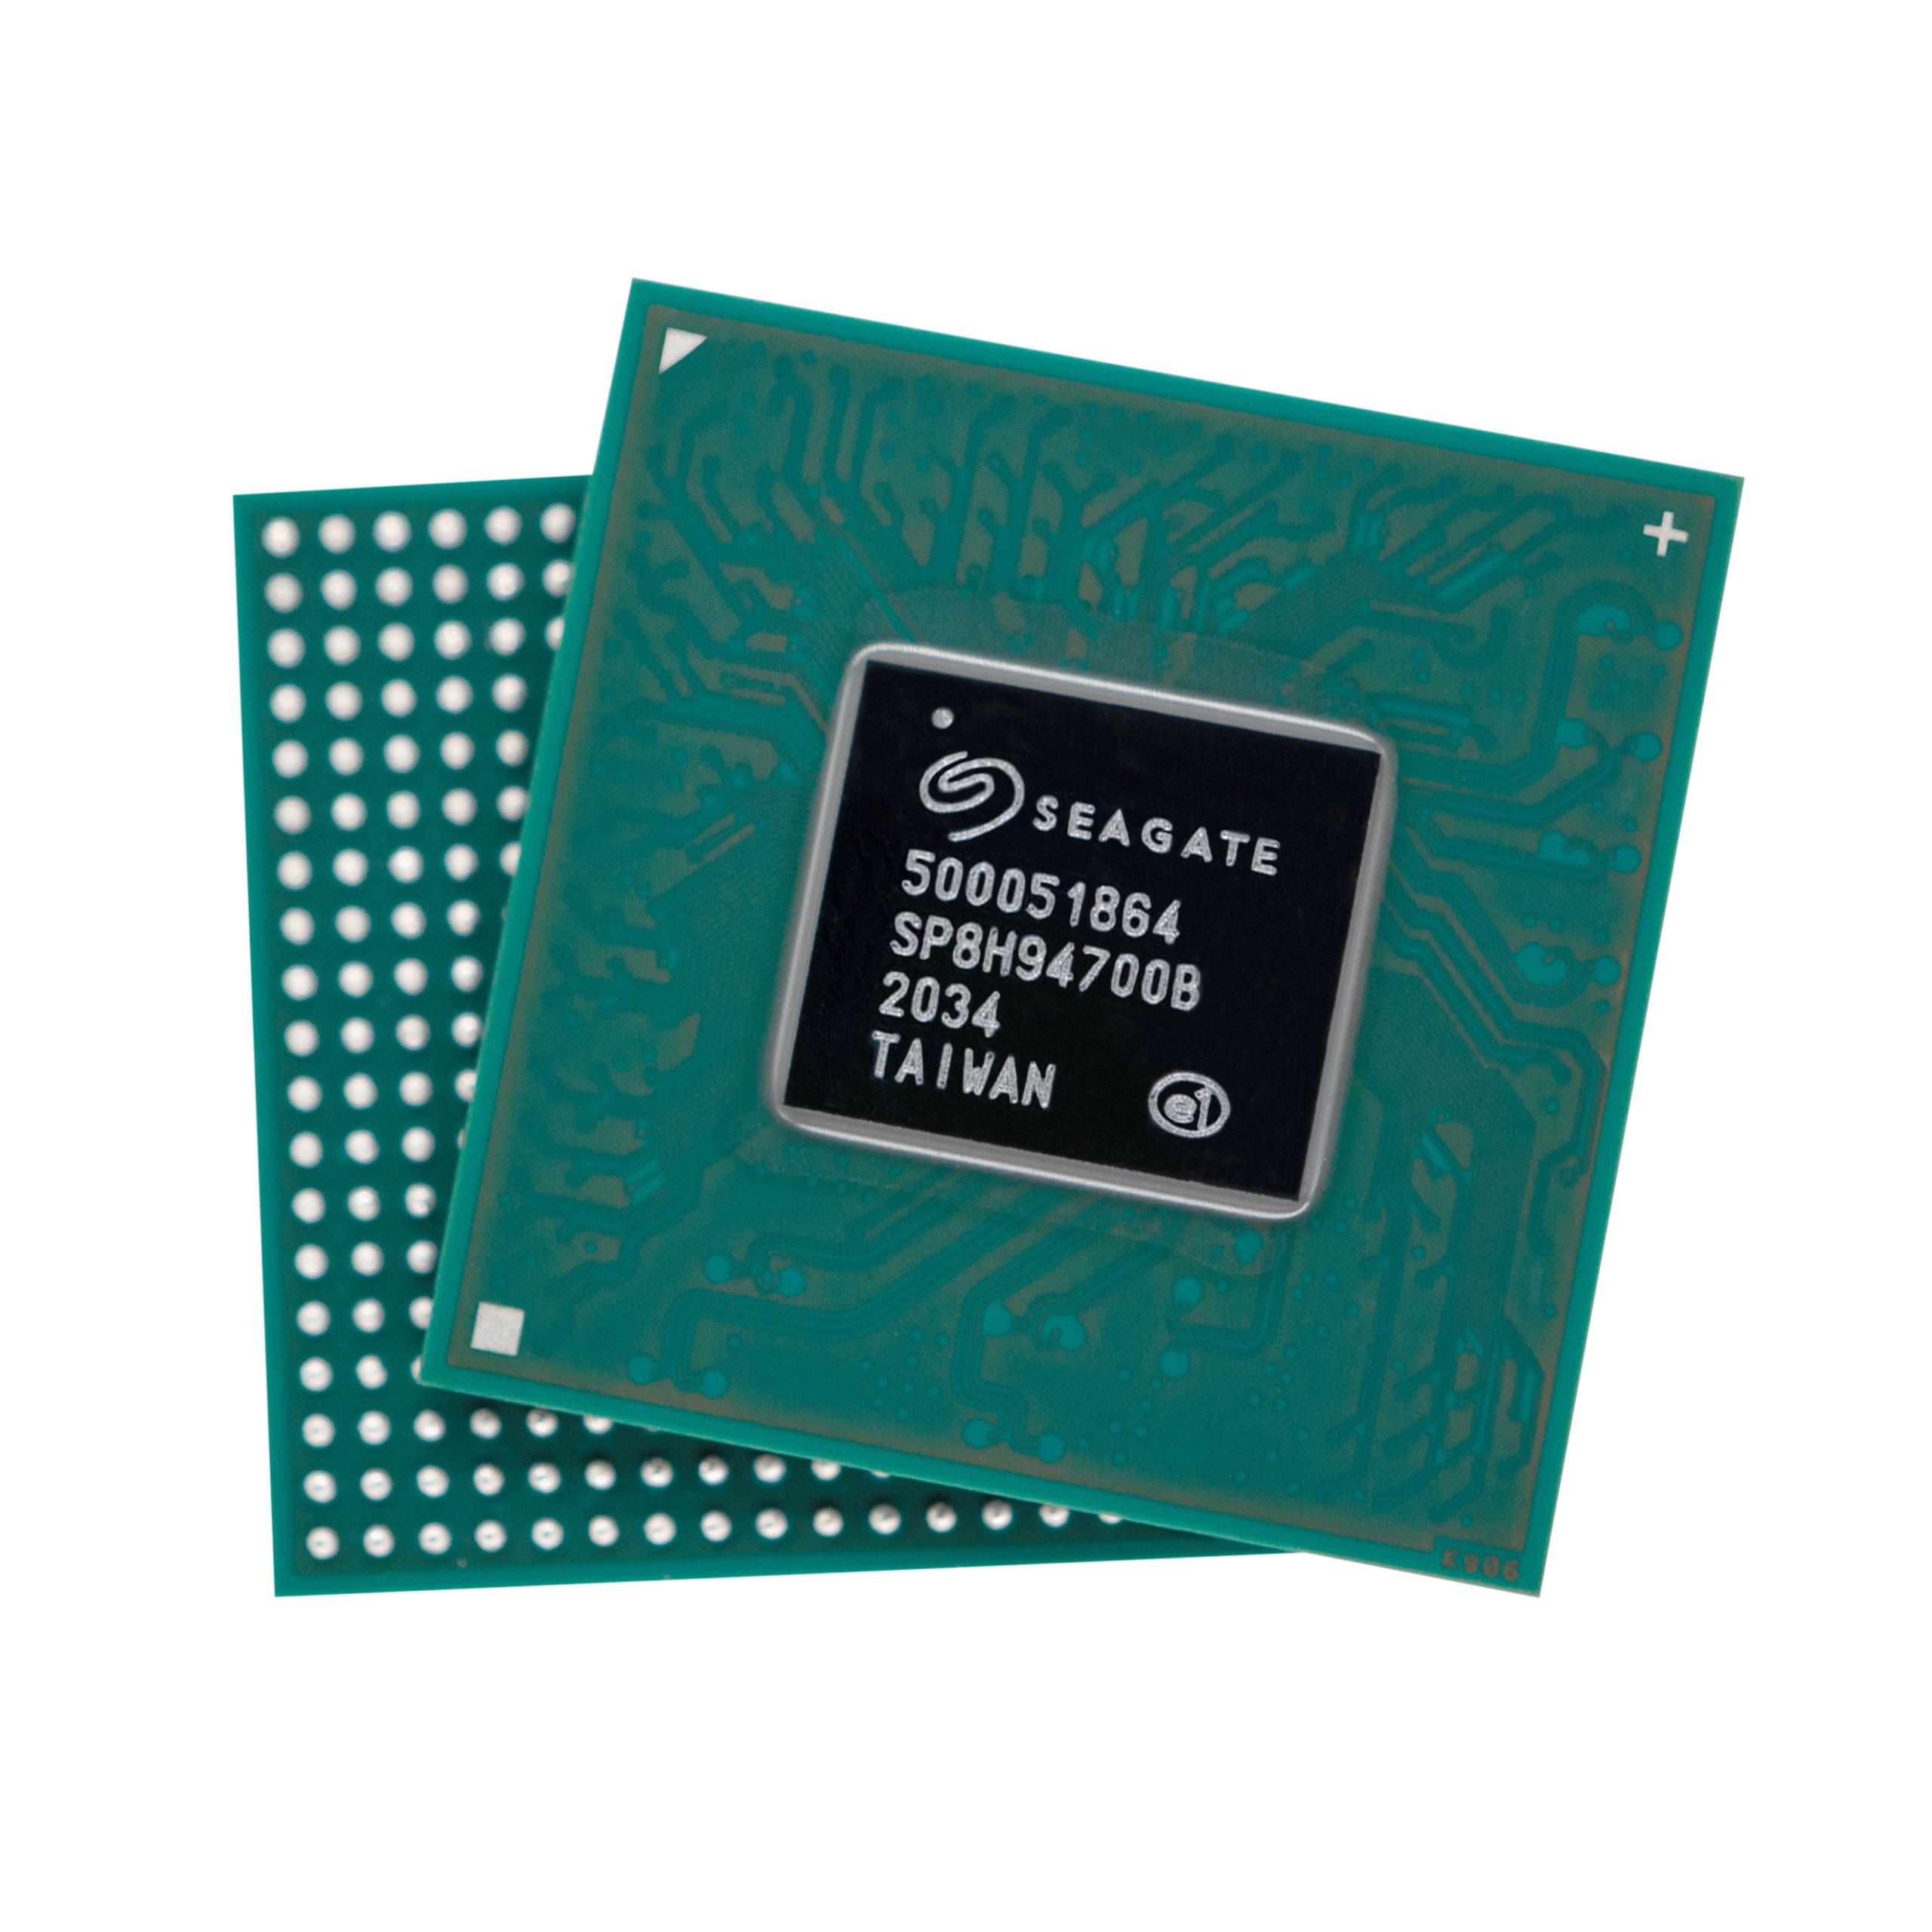 Seagate представила два процессора на базе RISC-V